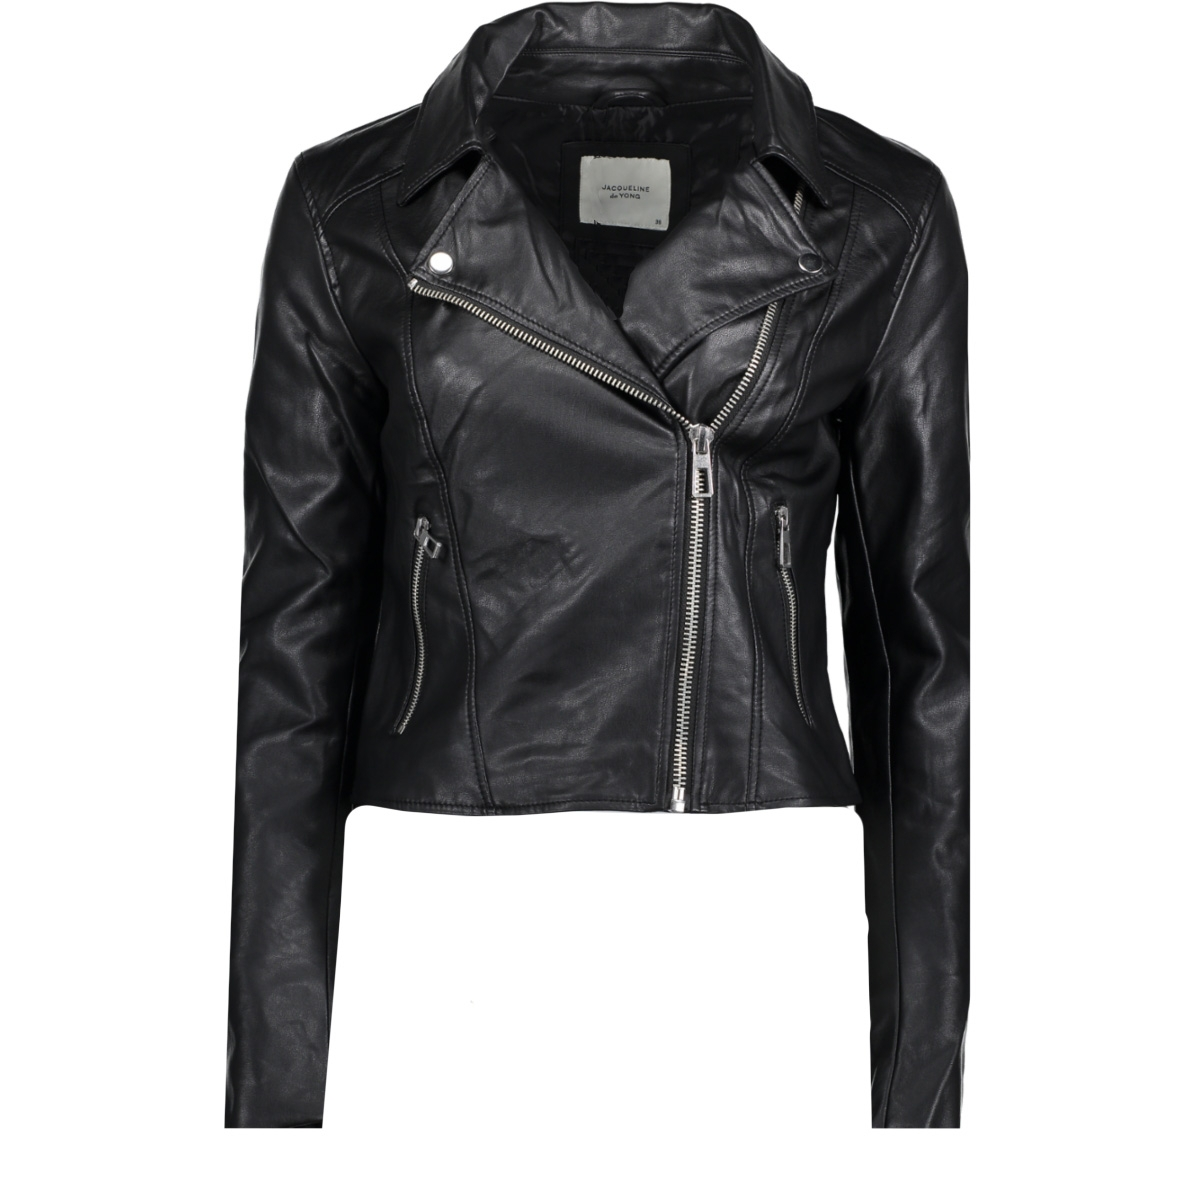 jacket yong 15160981 de jacqueline o short jdyesma faux leather jas nx4ngH